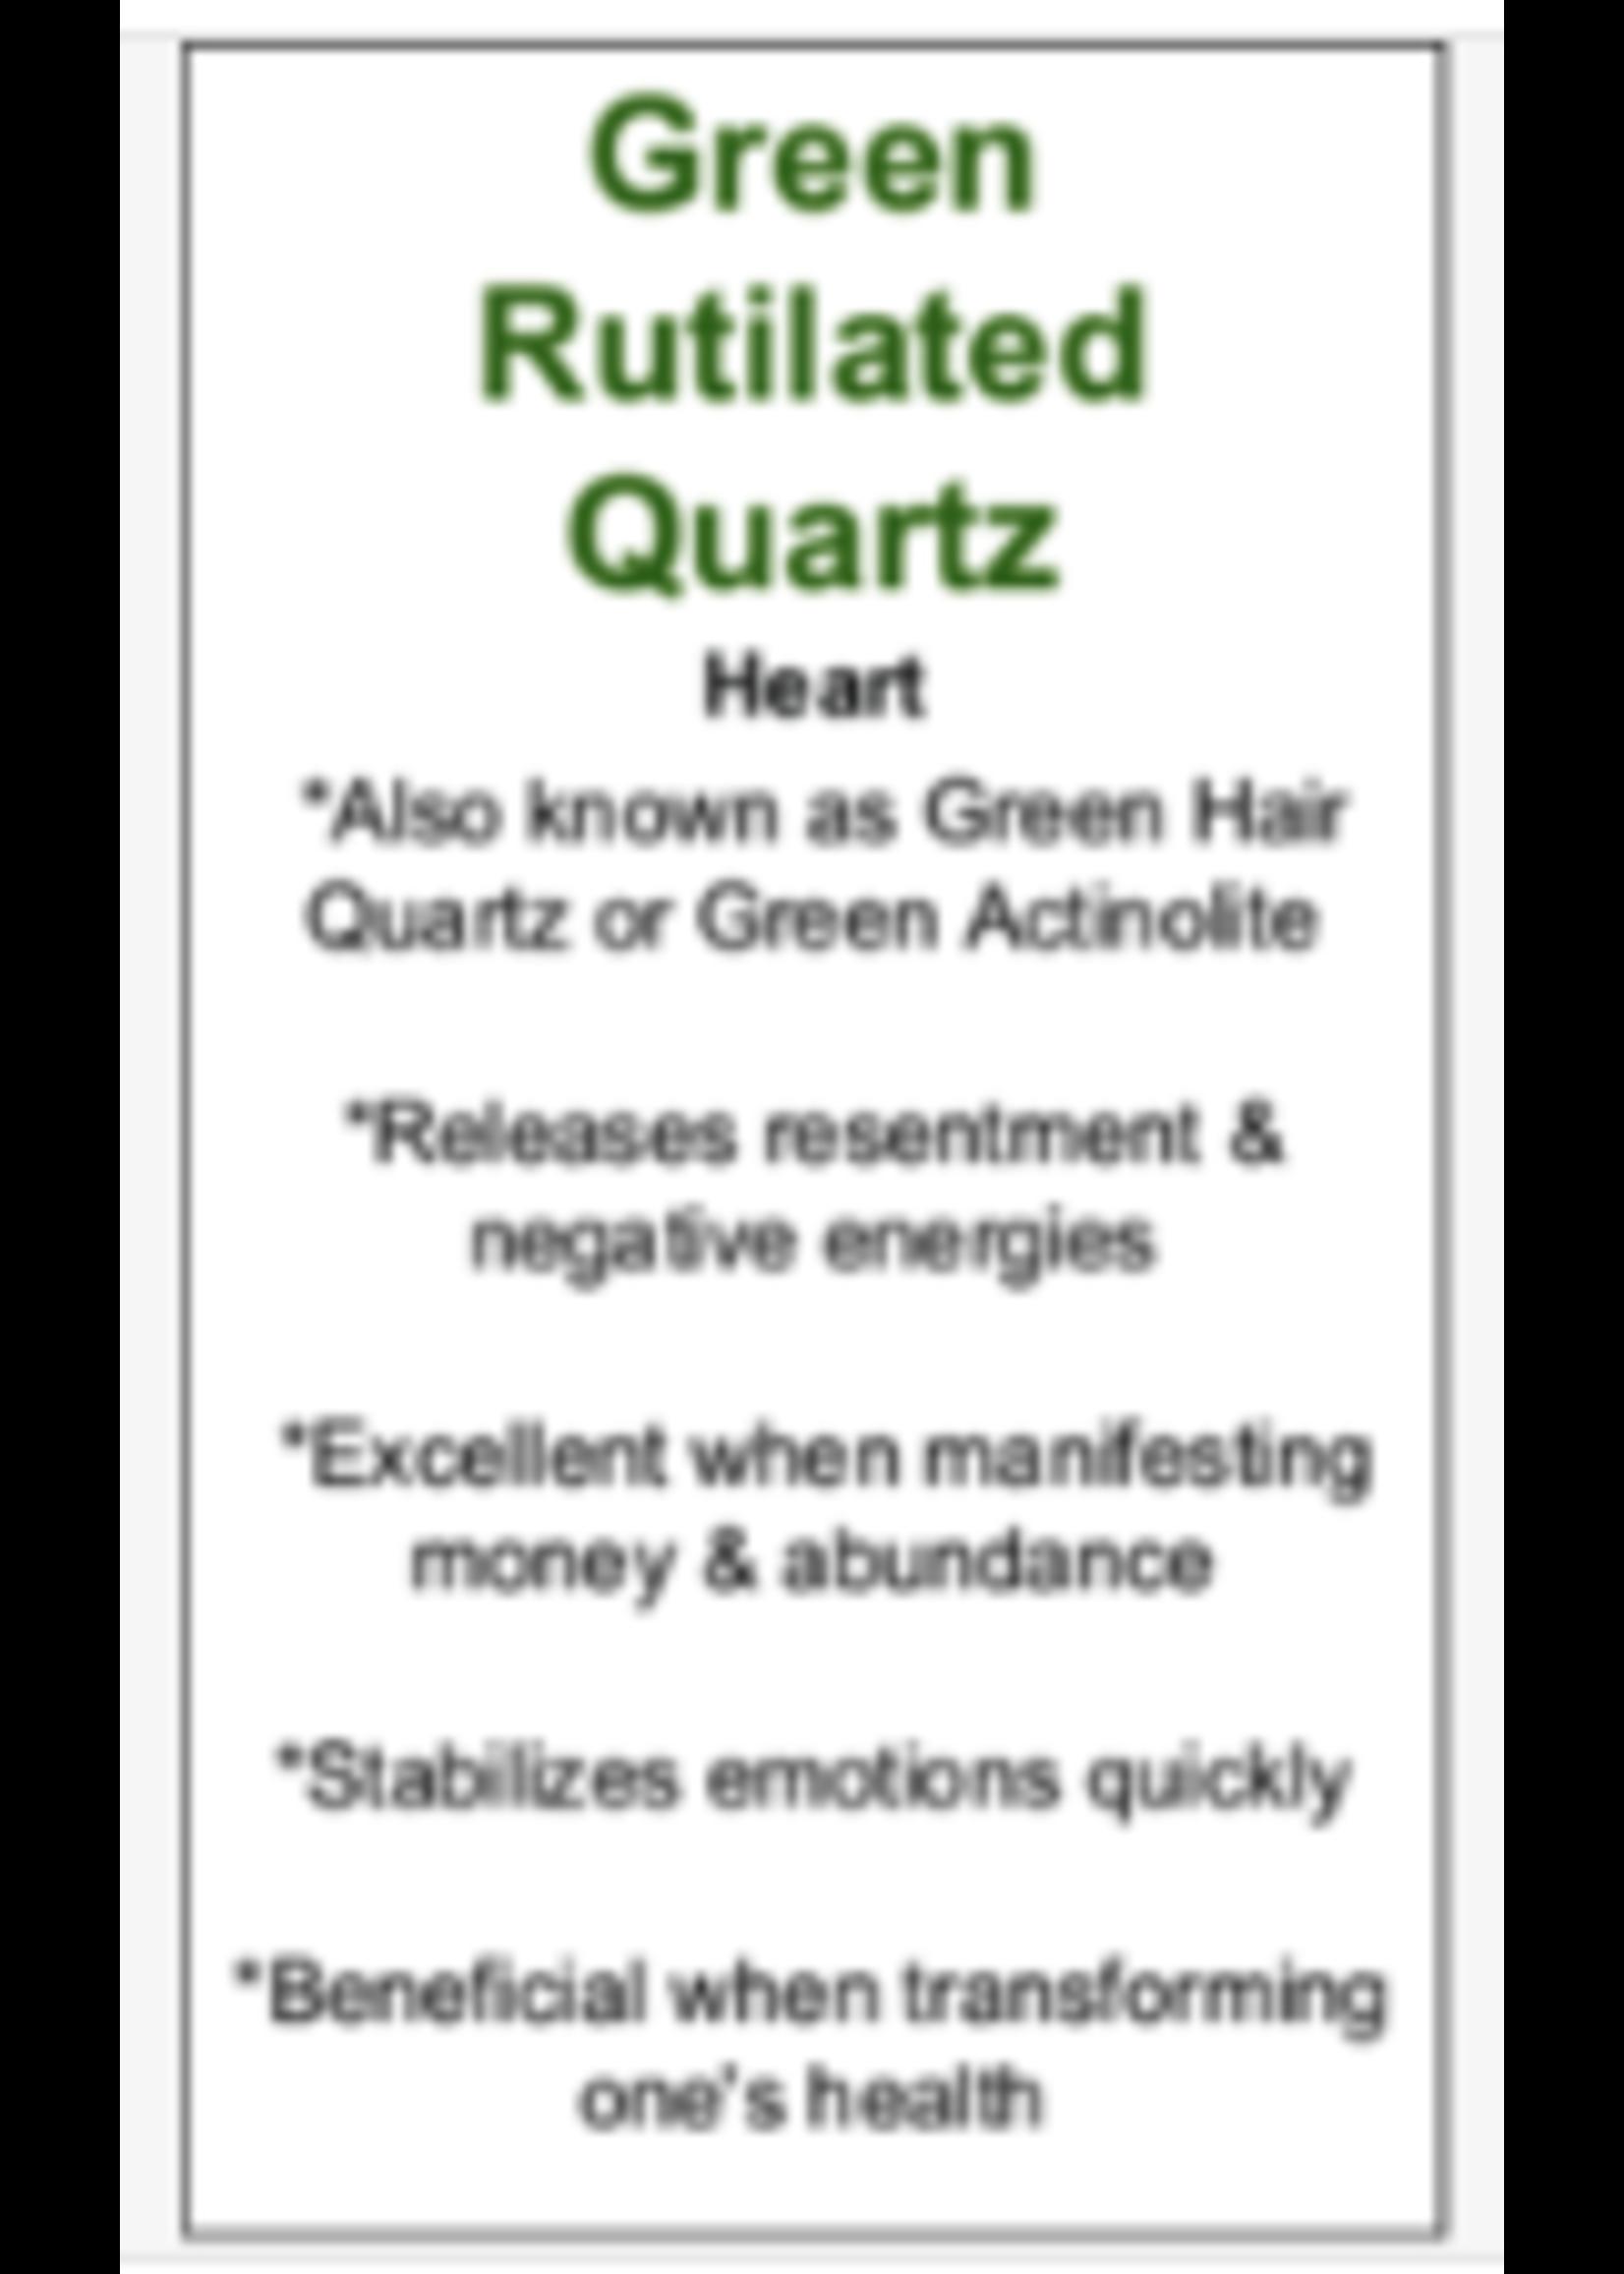 Green Rutilated Quartz Cards - Box of 250